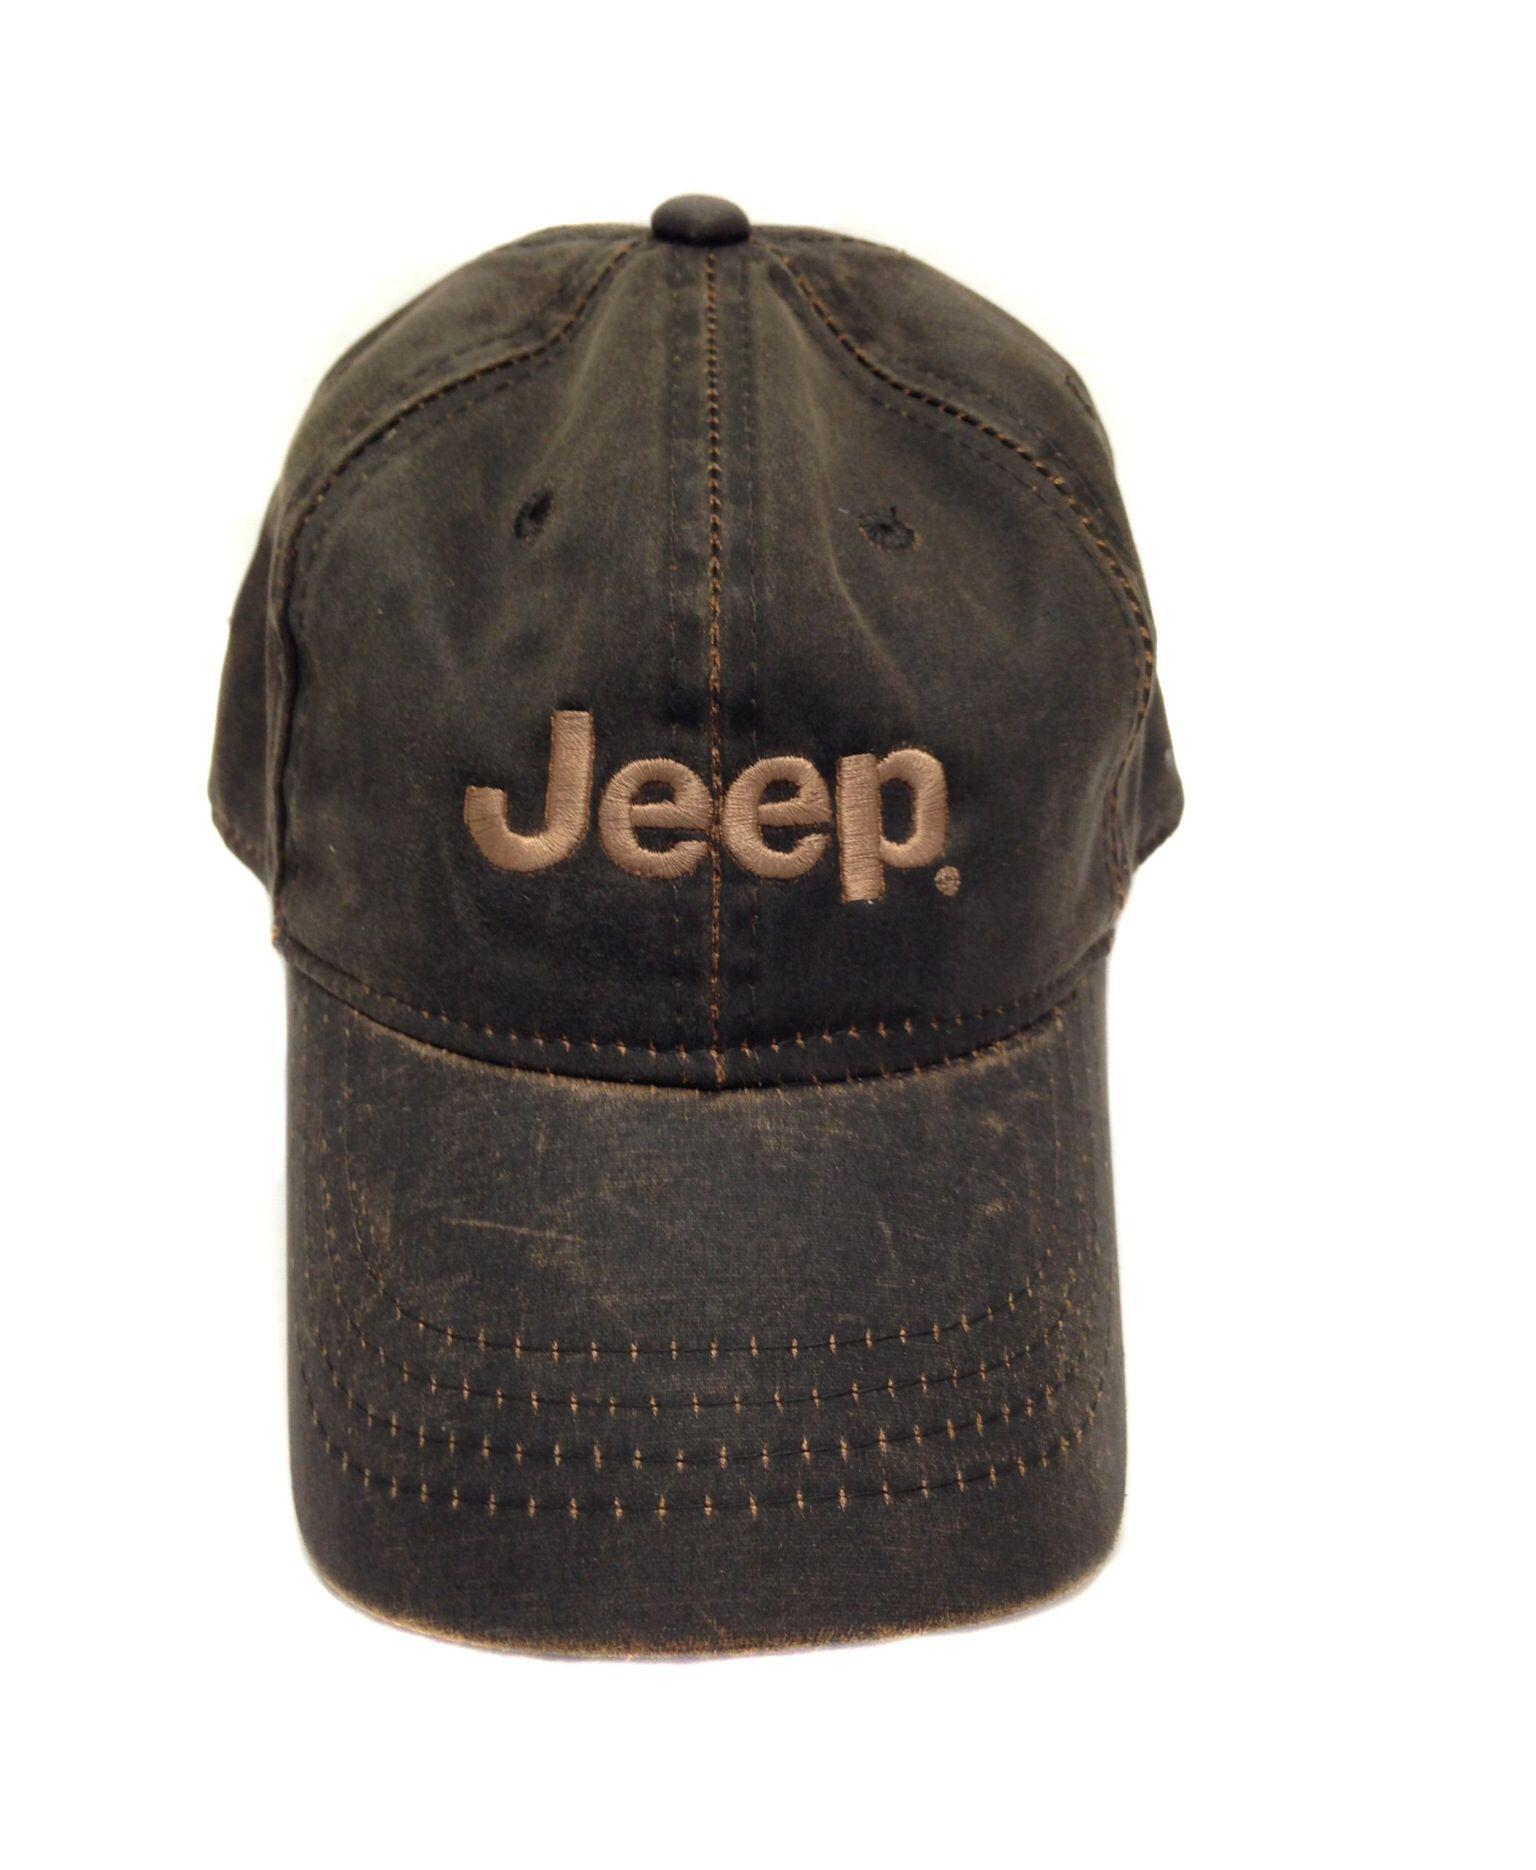 MOPAR Beanie Hat Embroidered Car Auto Logo Winter Warm Knit Mens Accessories